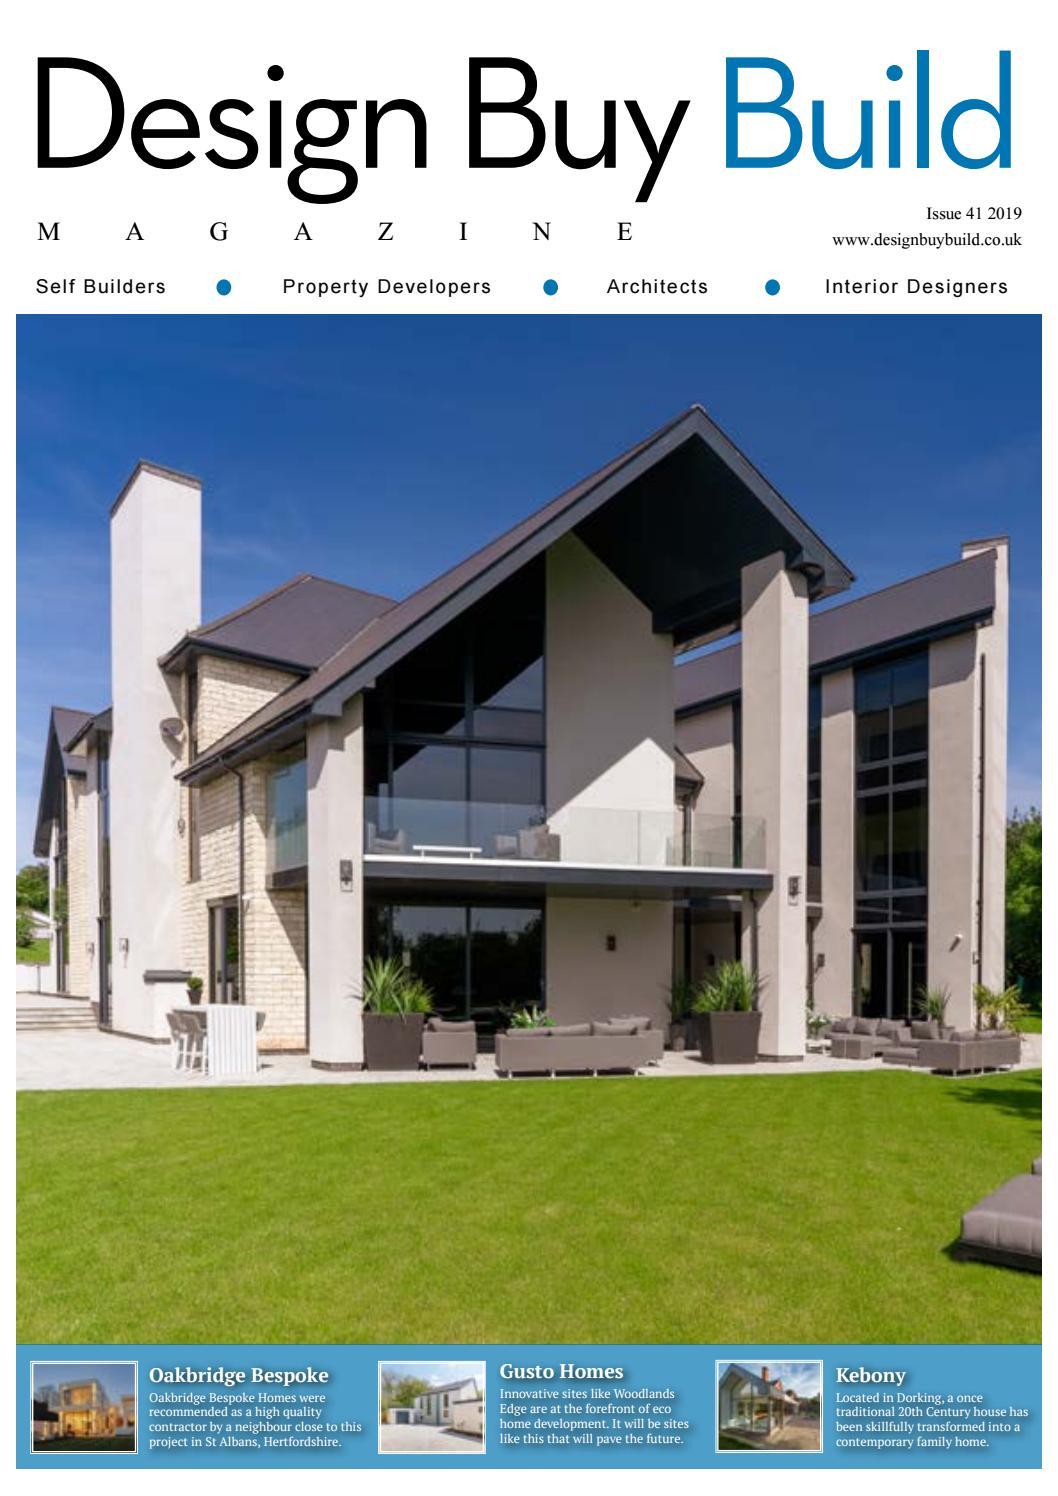 Home Sauna Kits Since 1974 design buy build issue 41 2019mh media global - issuu